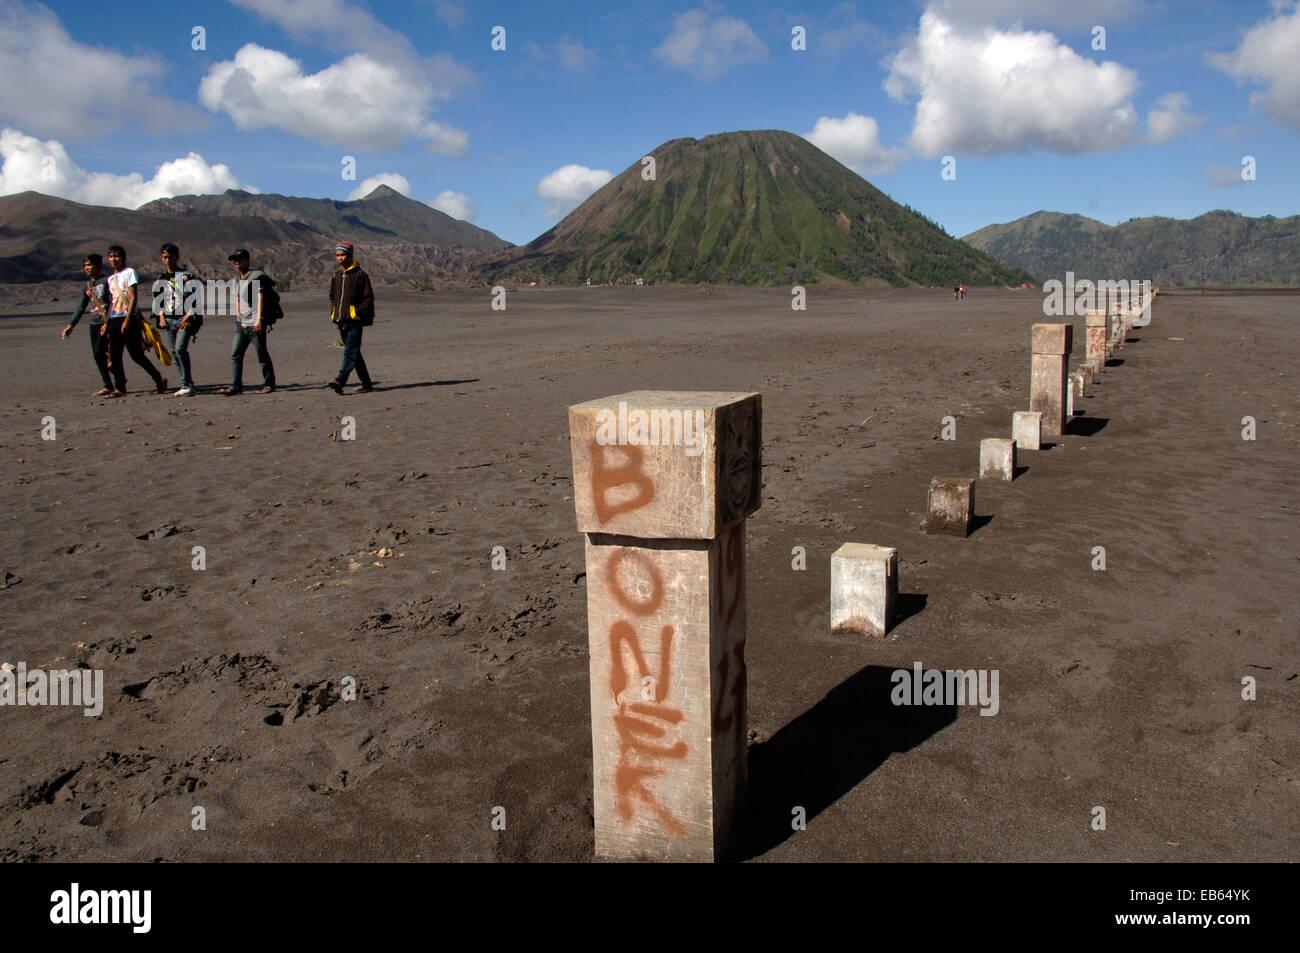 Vandalism in Mount Bromo, Indonesia - Stock Image